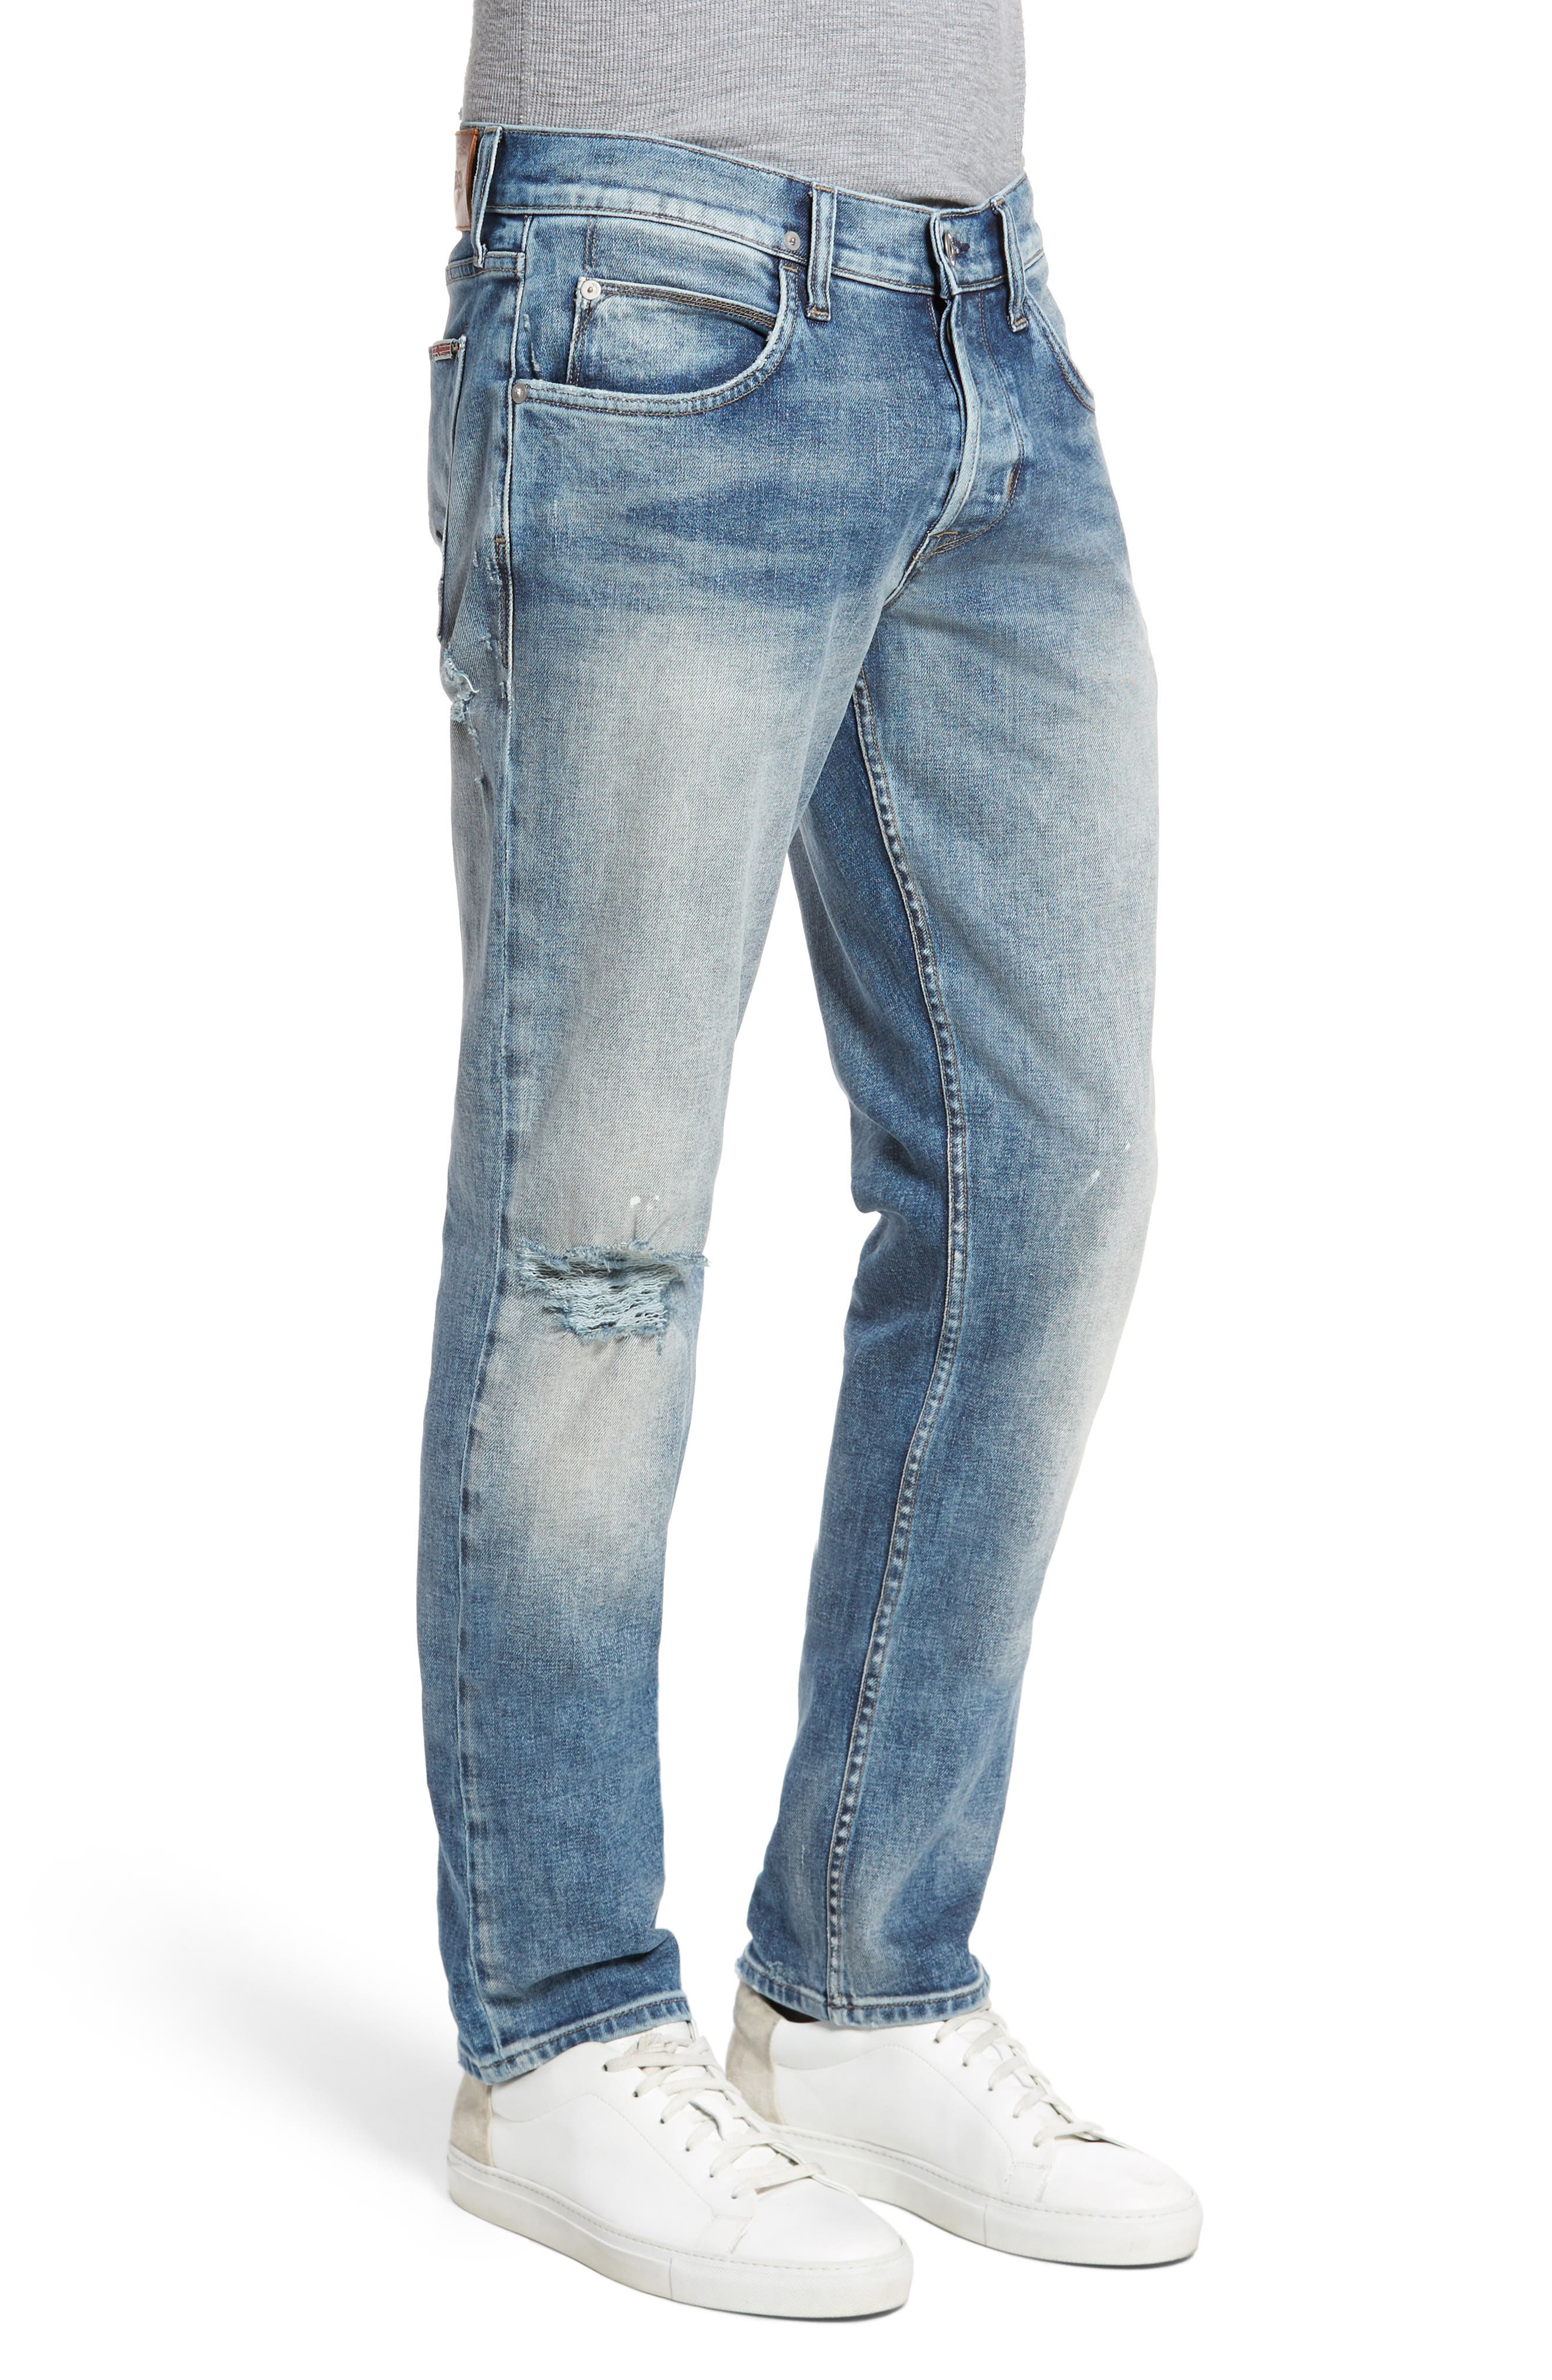 Blake Slim Fit Jeans,                             Alternate thumbnail 3, color,                             451